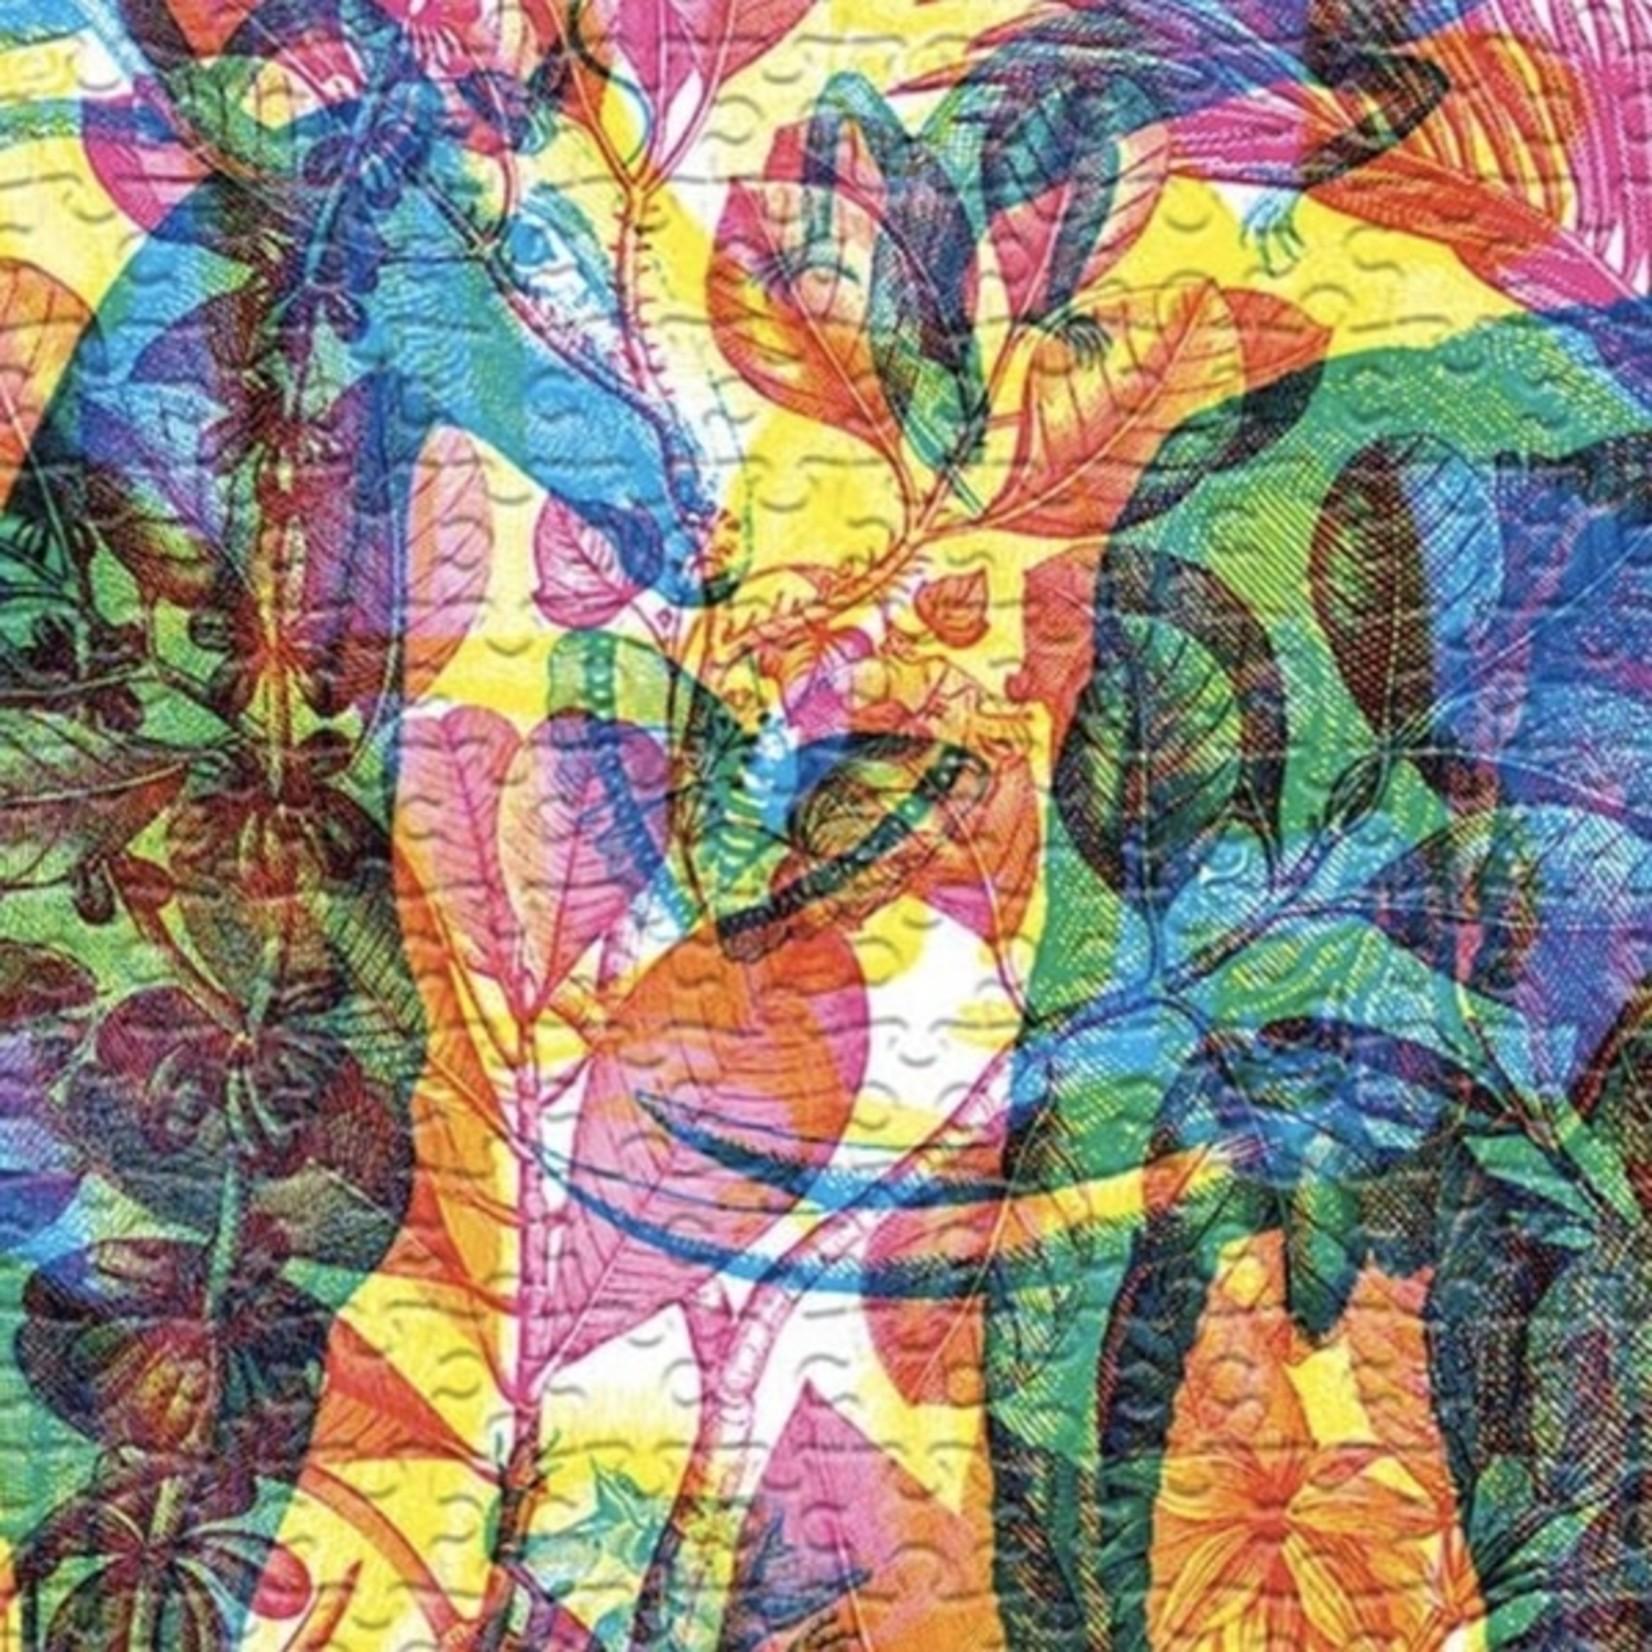 Carnovsky Jungle Puzzle